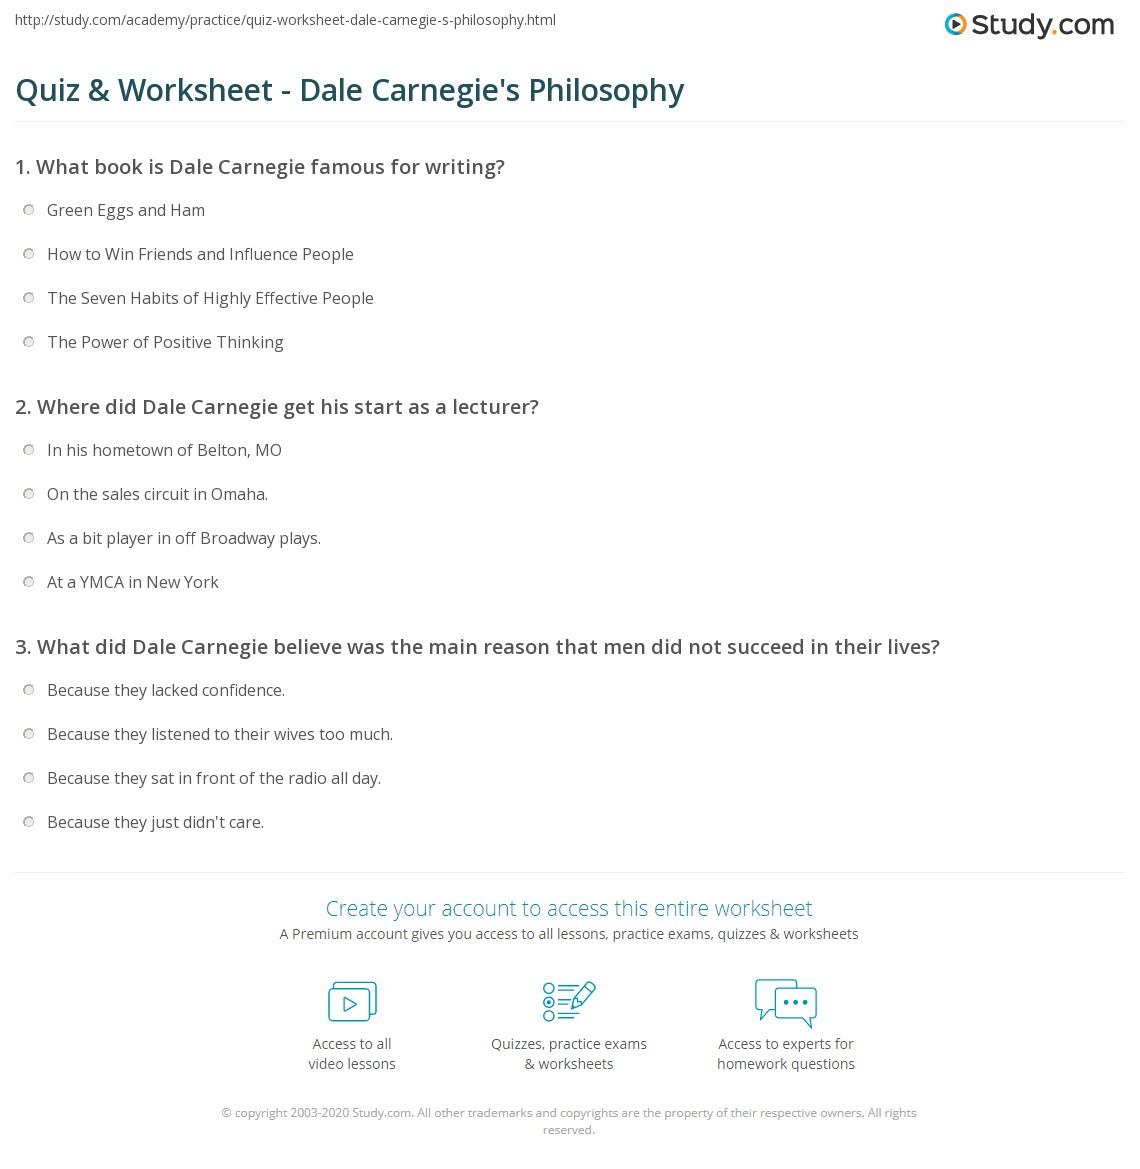 Worksheets 7 Habits Worksheets quiz worksheet dale carnegies philosophy study com print carnegie self improvement salesmanship public speaking worksheet